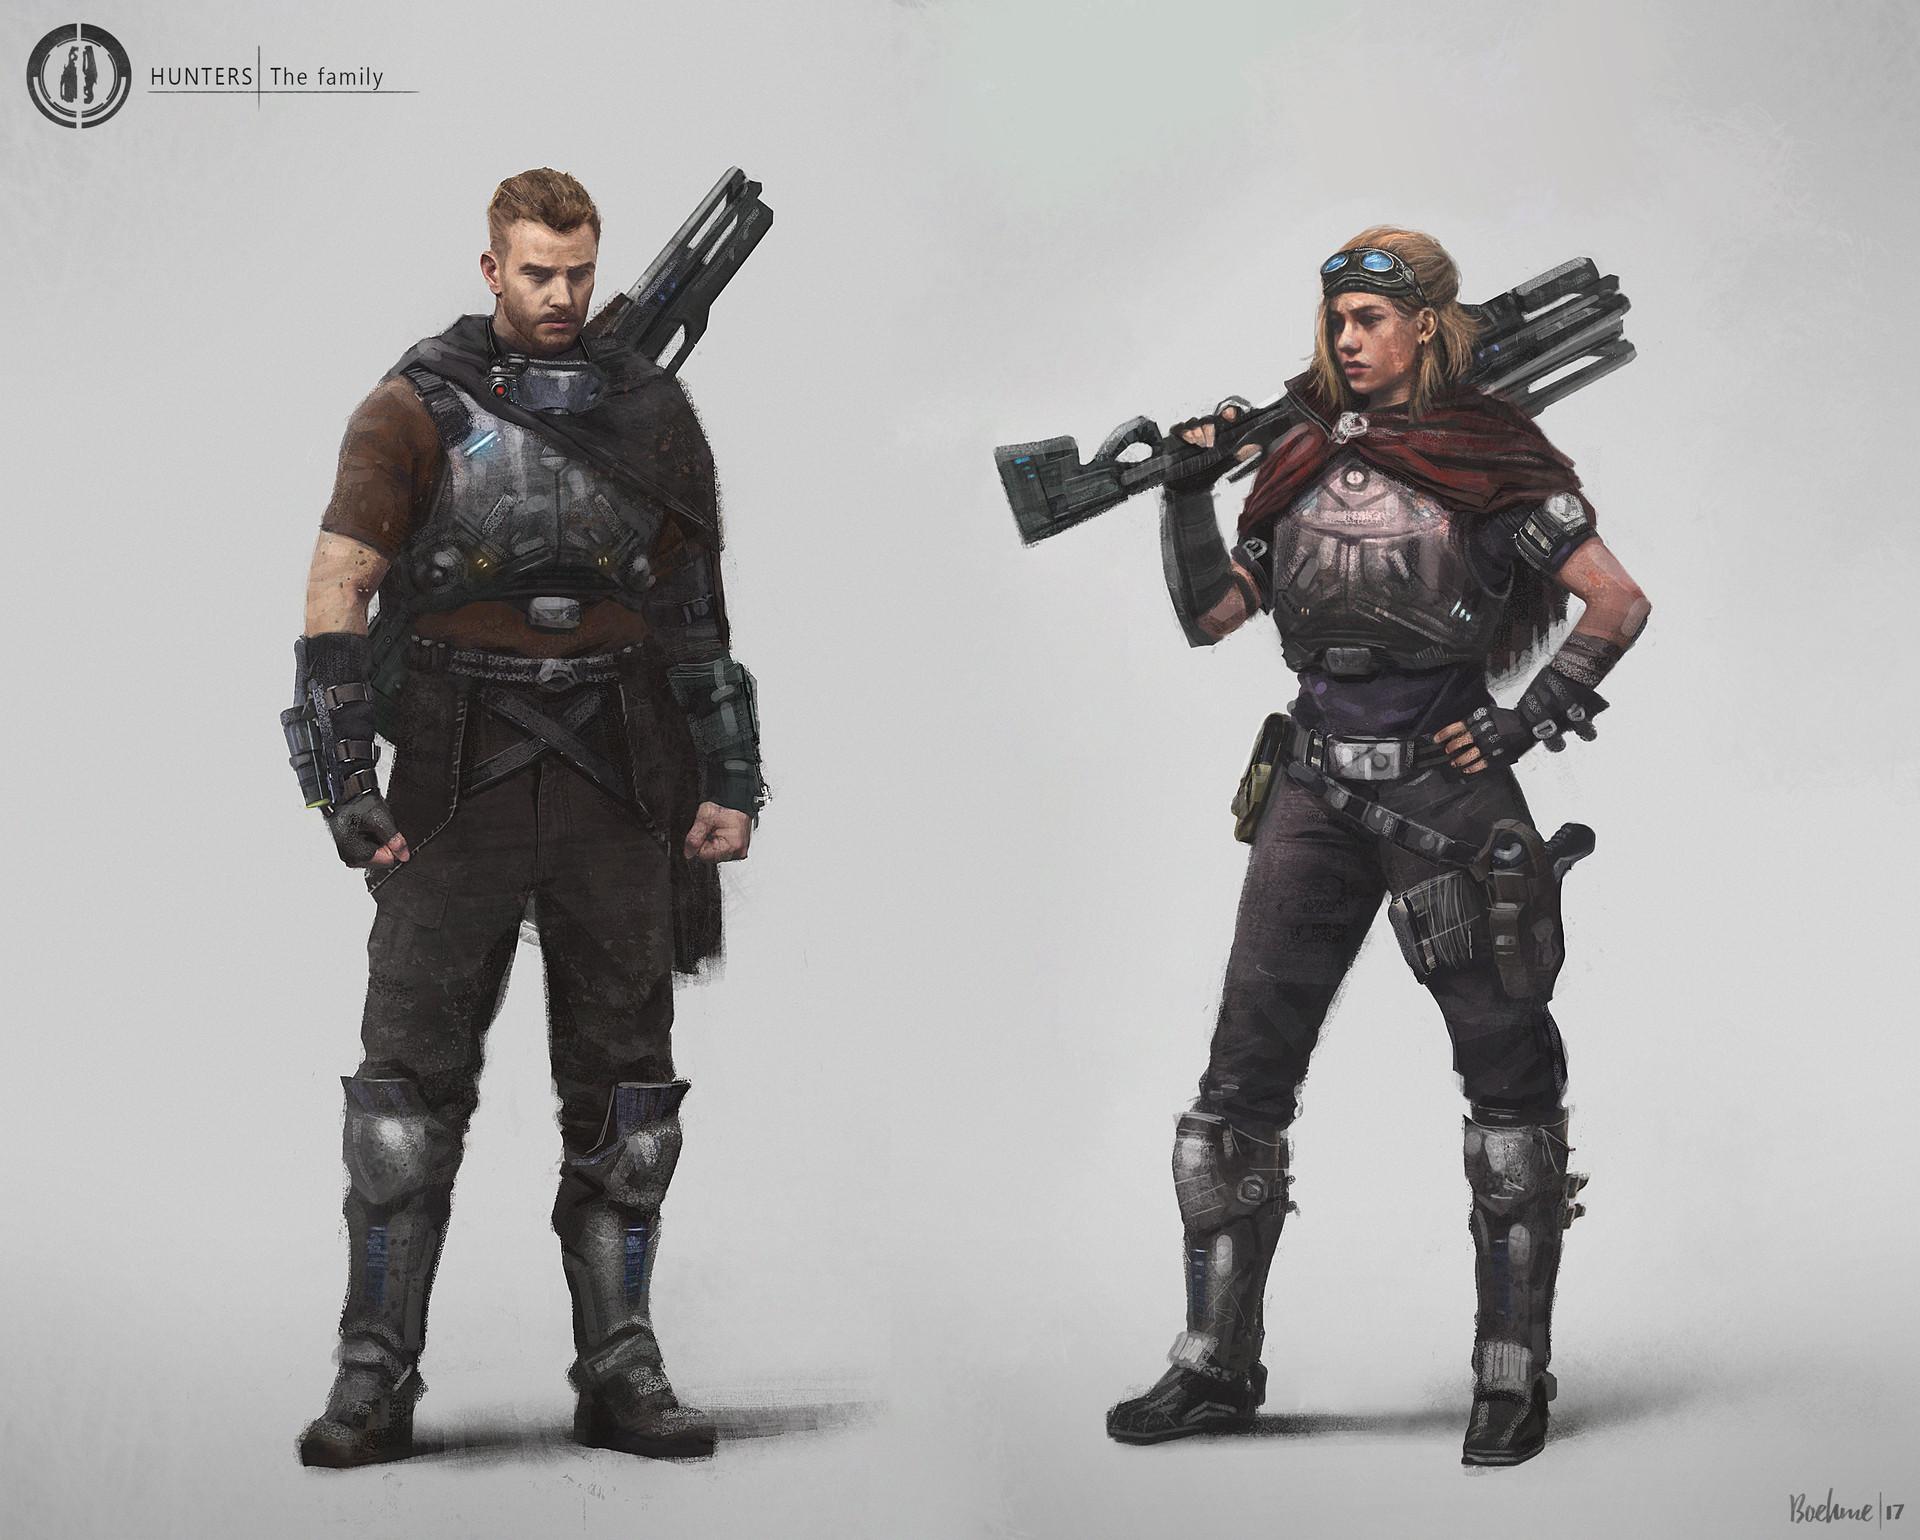 Mobo boehme hunter both